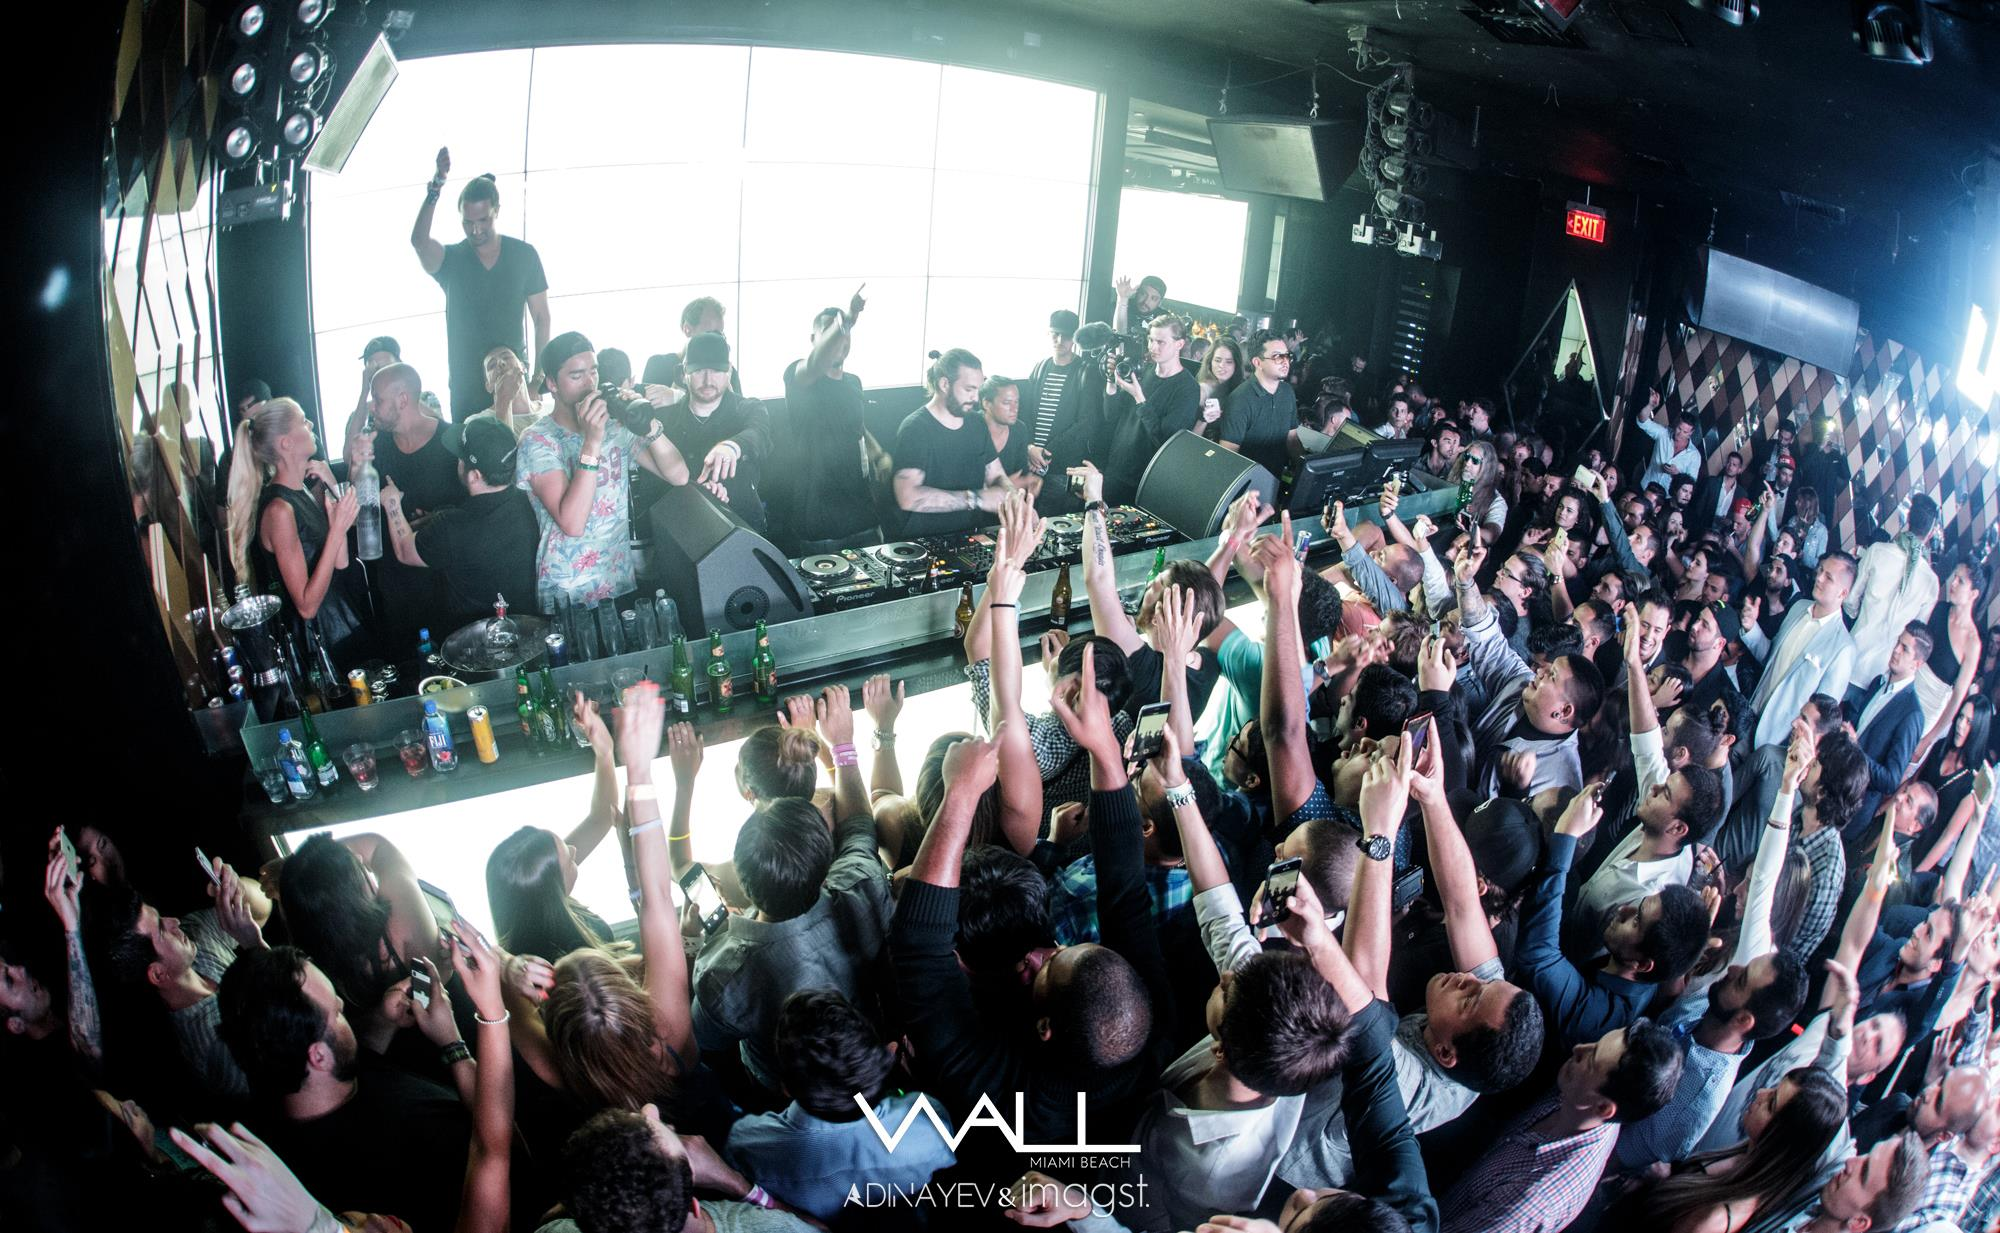 The best Miami Club and Beach Bar